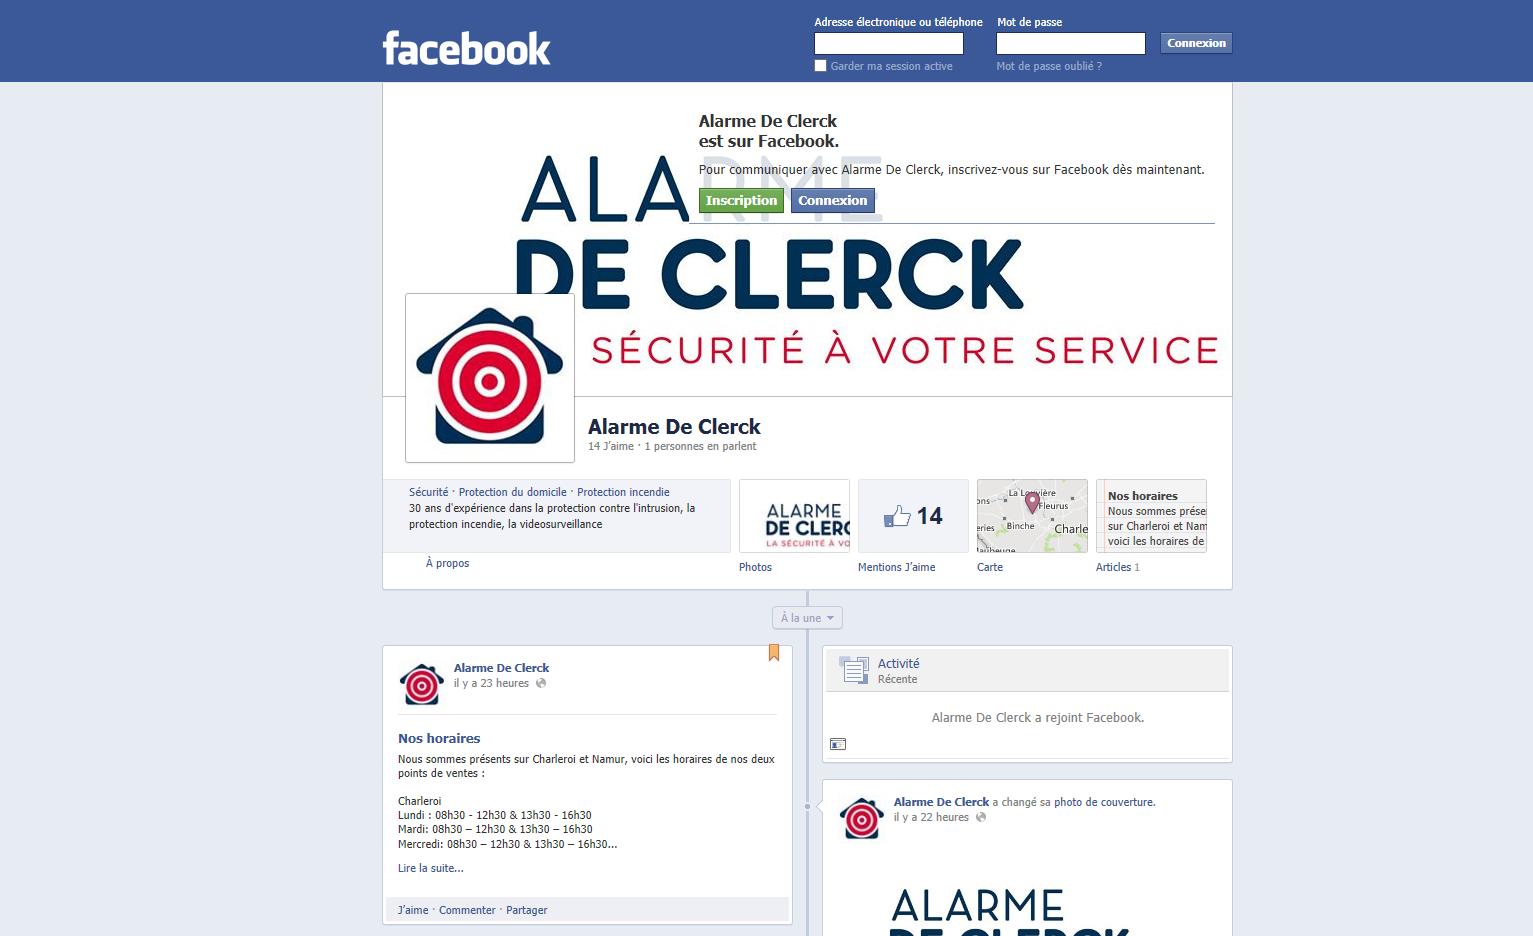 Alarme De Clerck sur Facebook